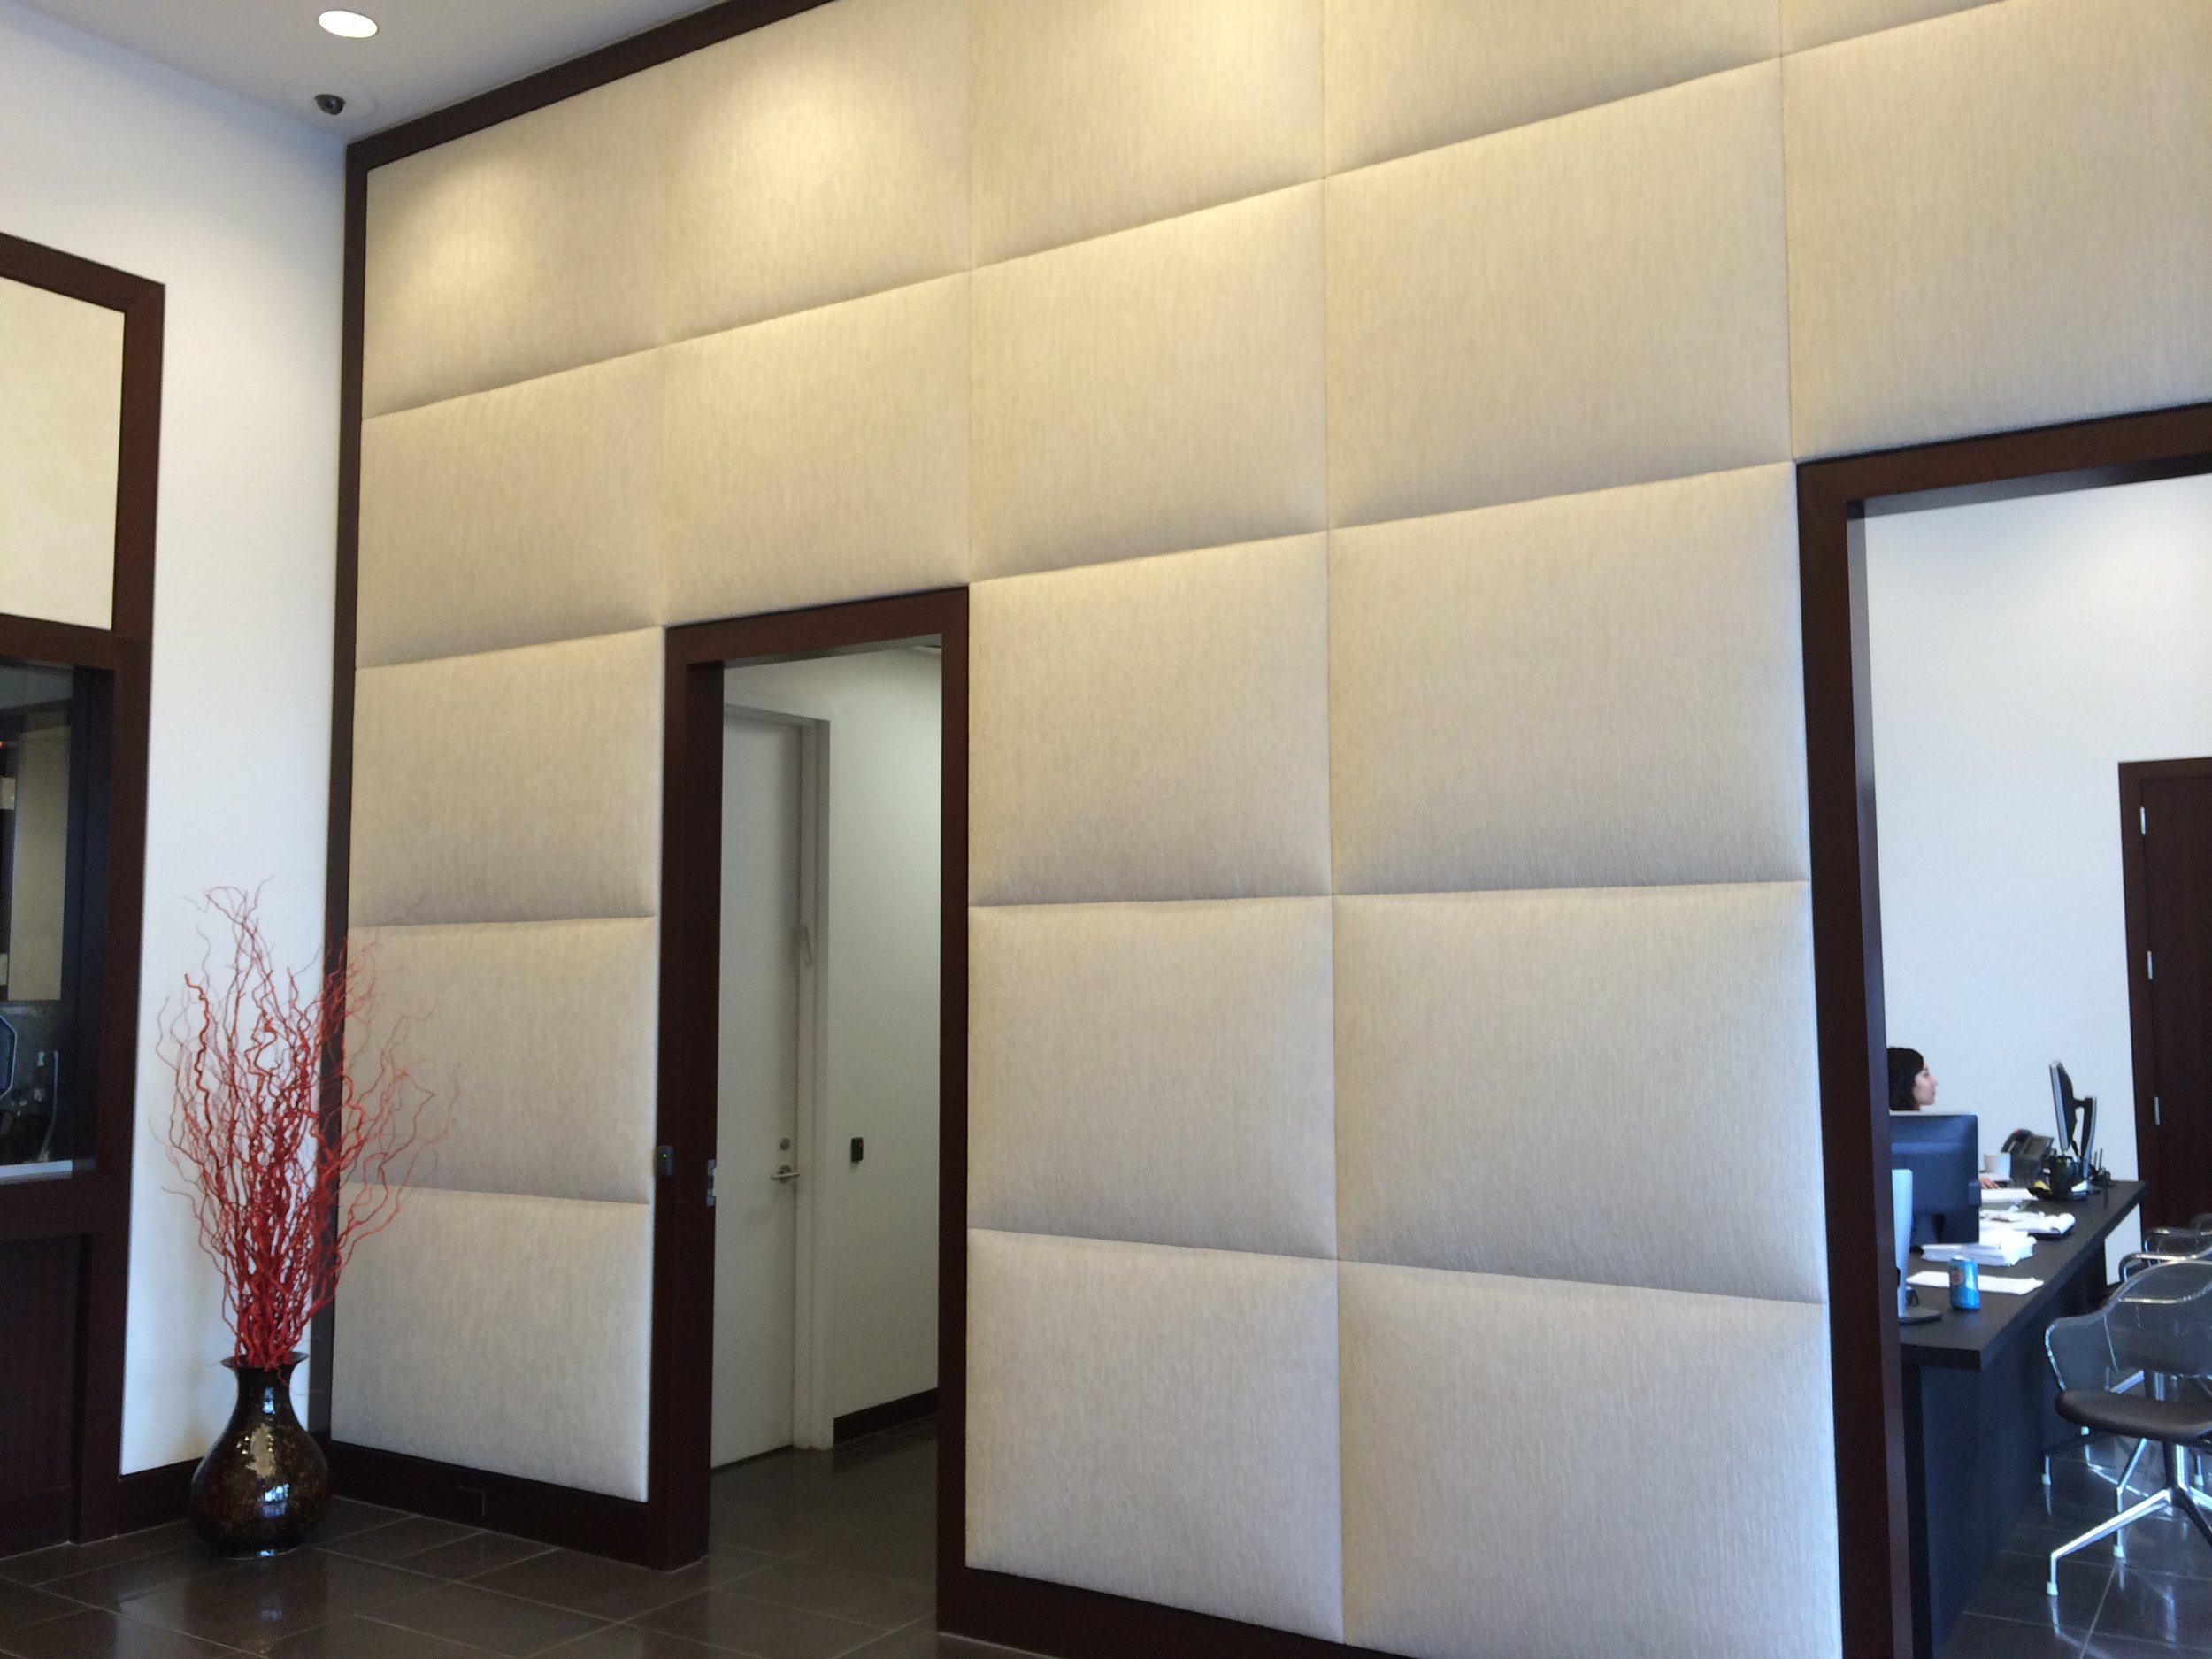 padded walls.JPG